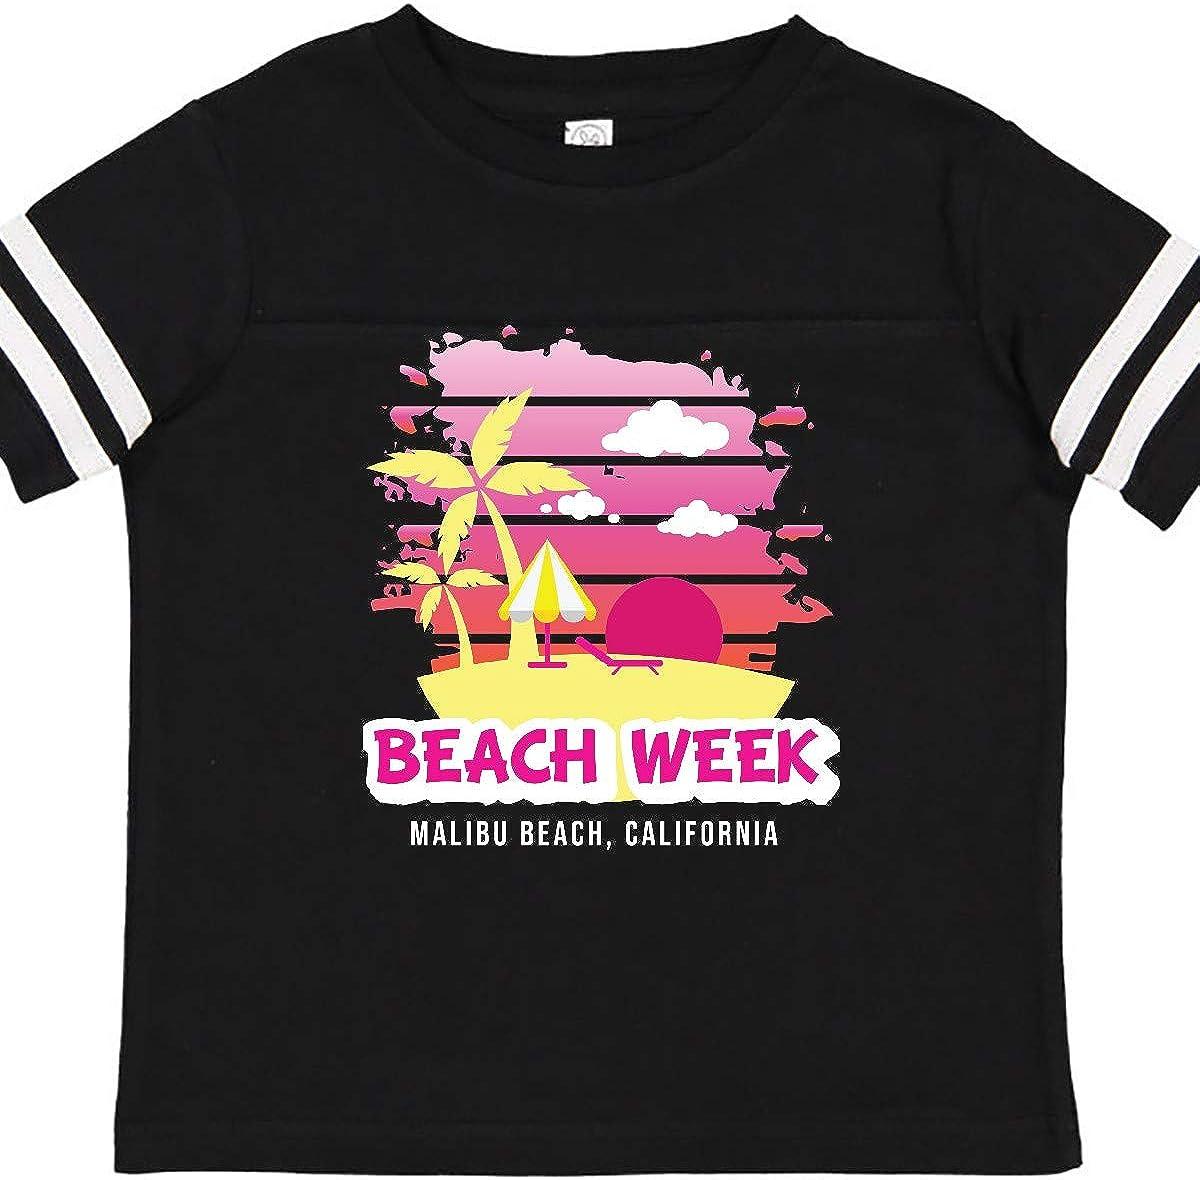 inktastic Beach Week Malibu Beach California with Palm Trees Toddler T-Shirt